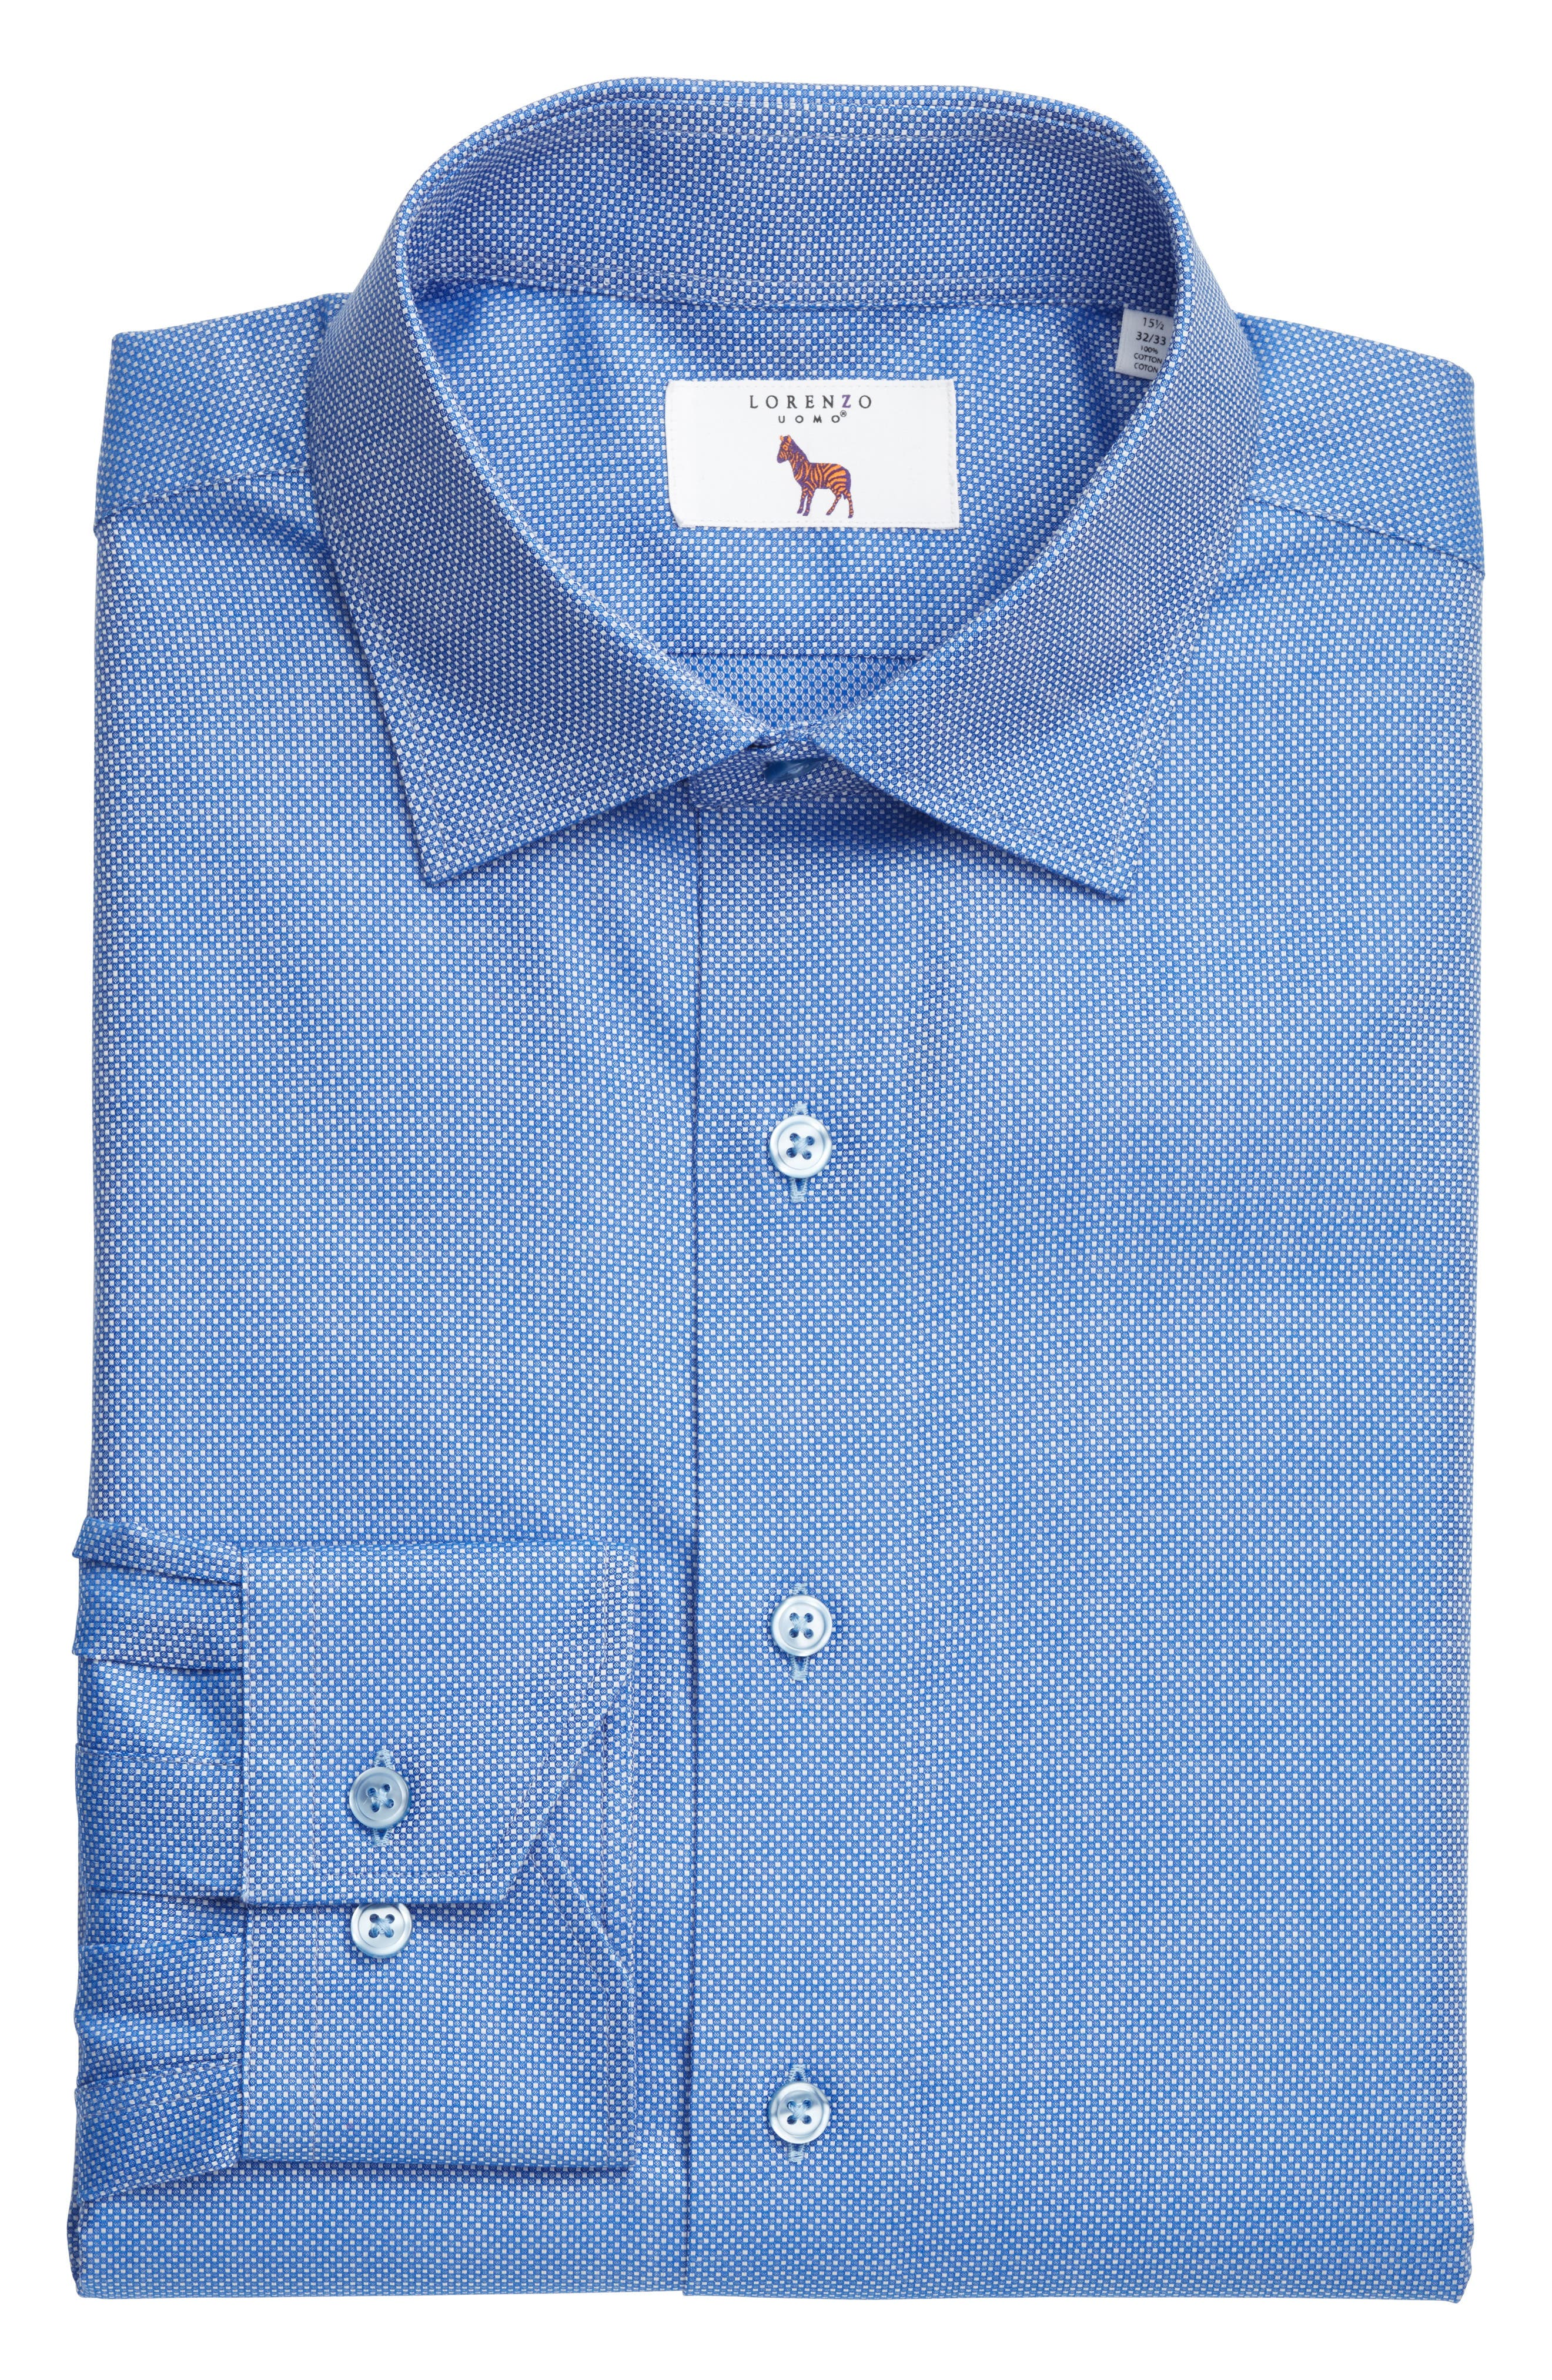 Trim Fit Textured Dress Shirt,                             Alternate thumbnail 4, color,                             Navy